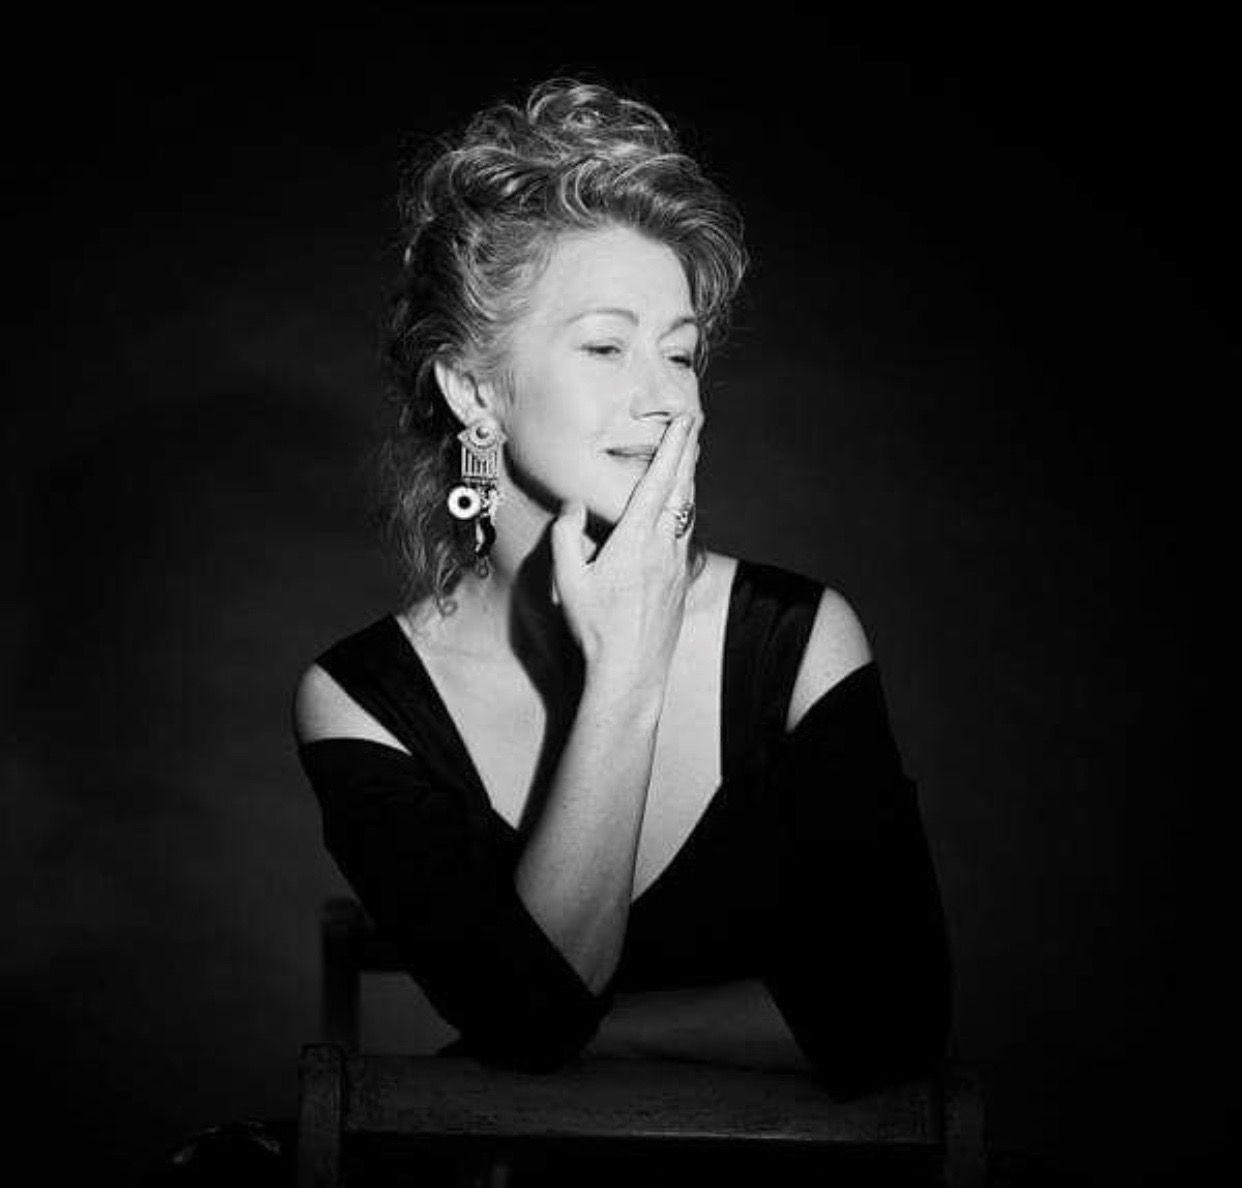 Love this photo of Helen Mirren...